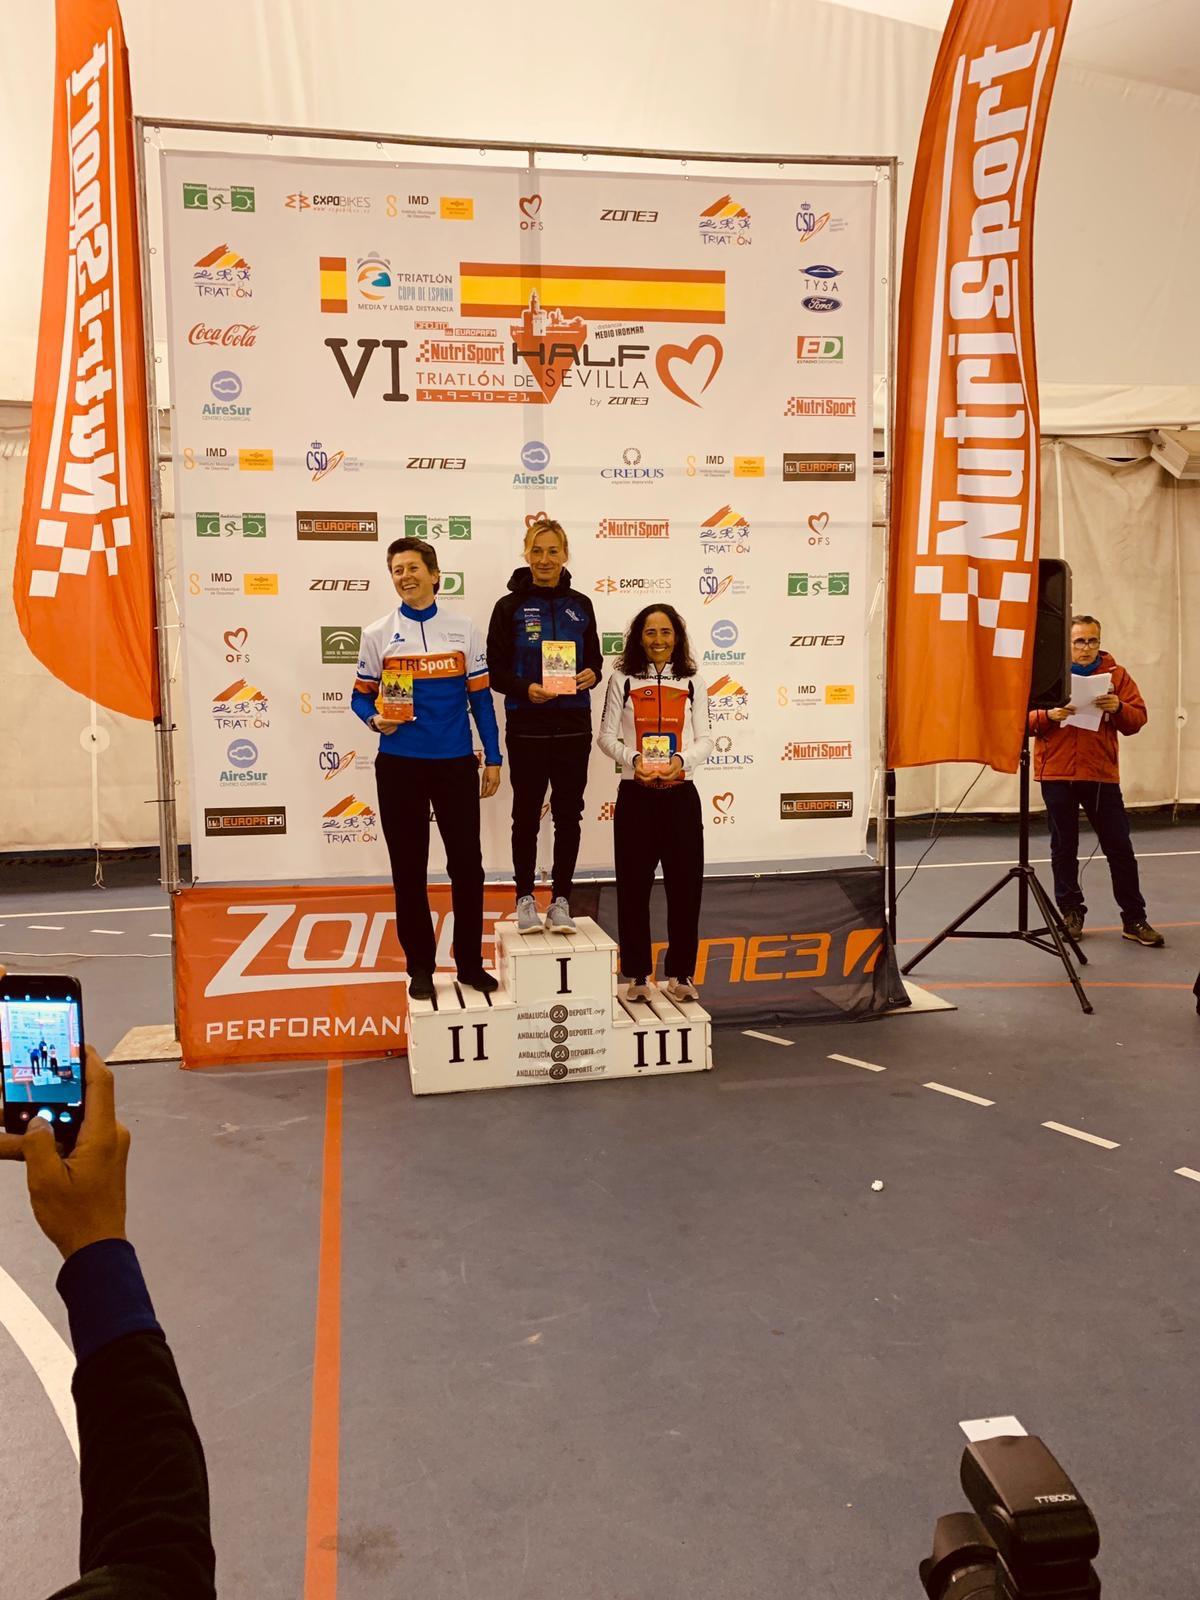 triatlon media distancia lisboa